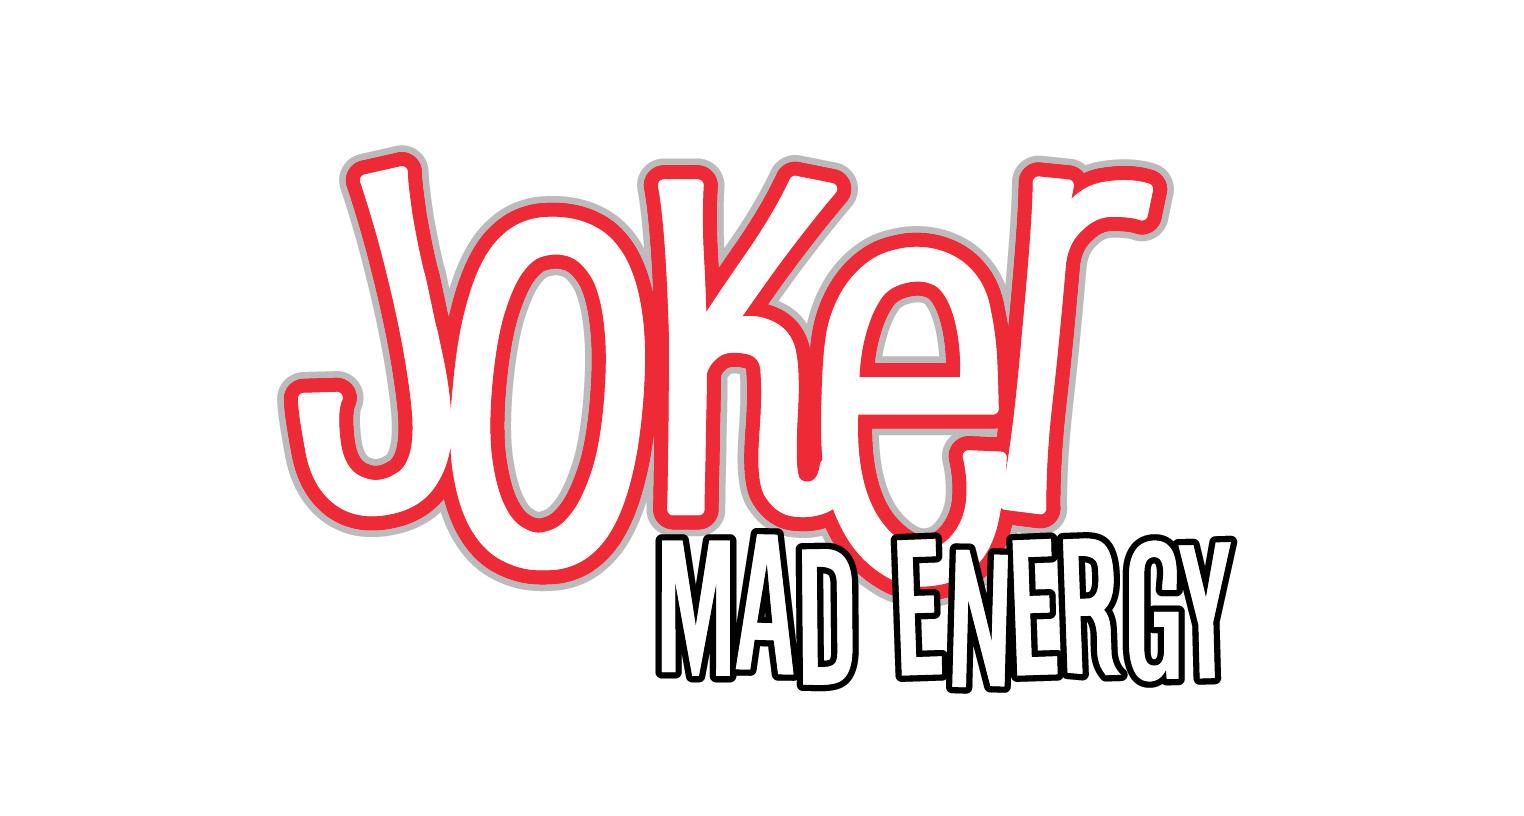 JOKER black mad01.jpg